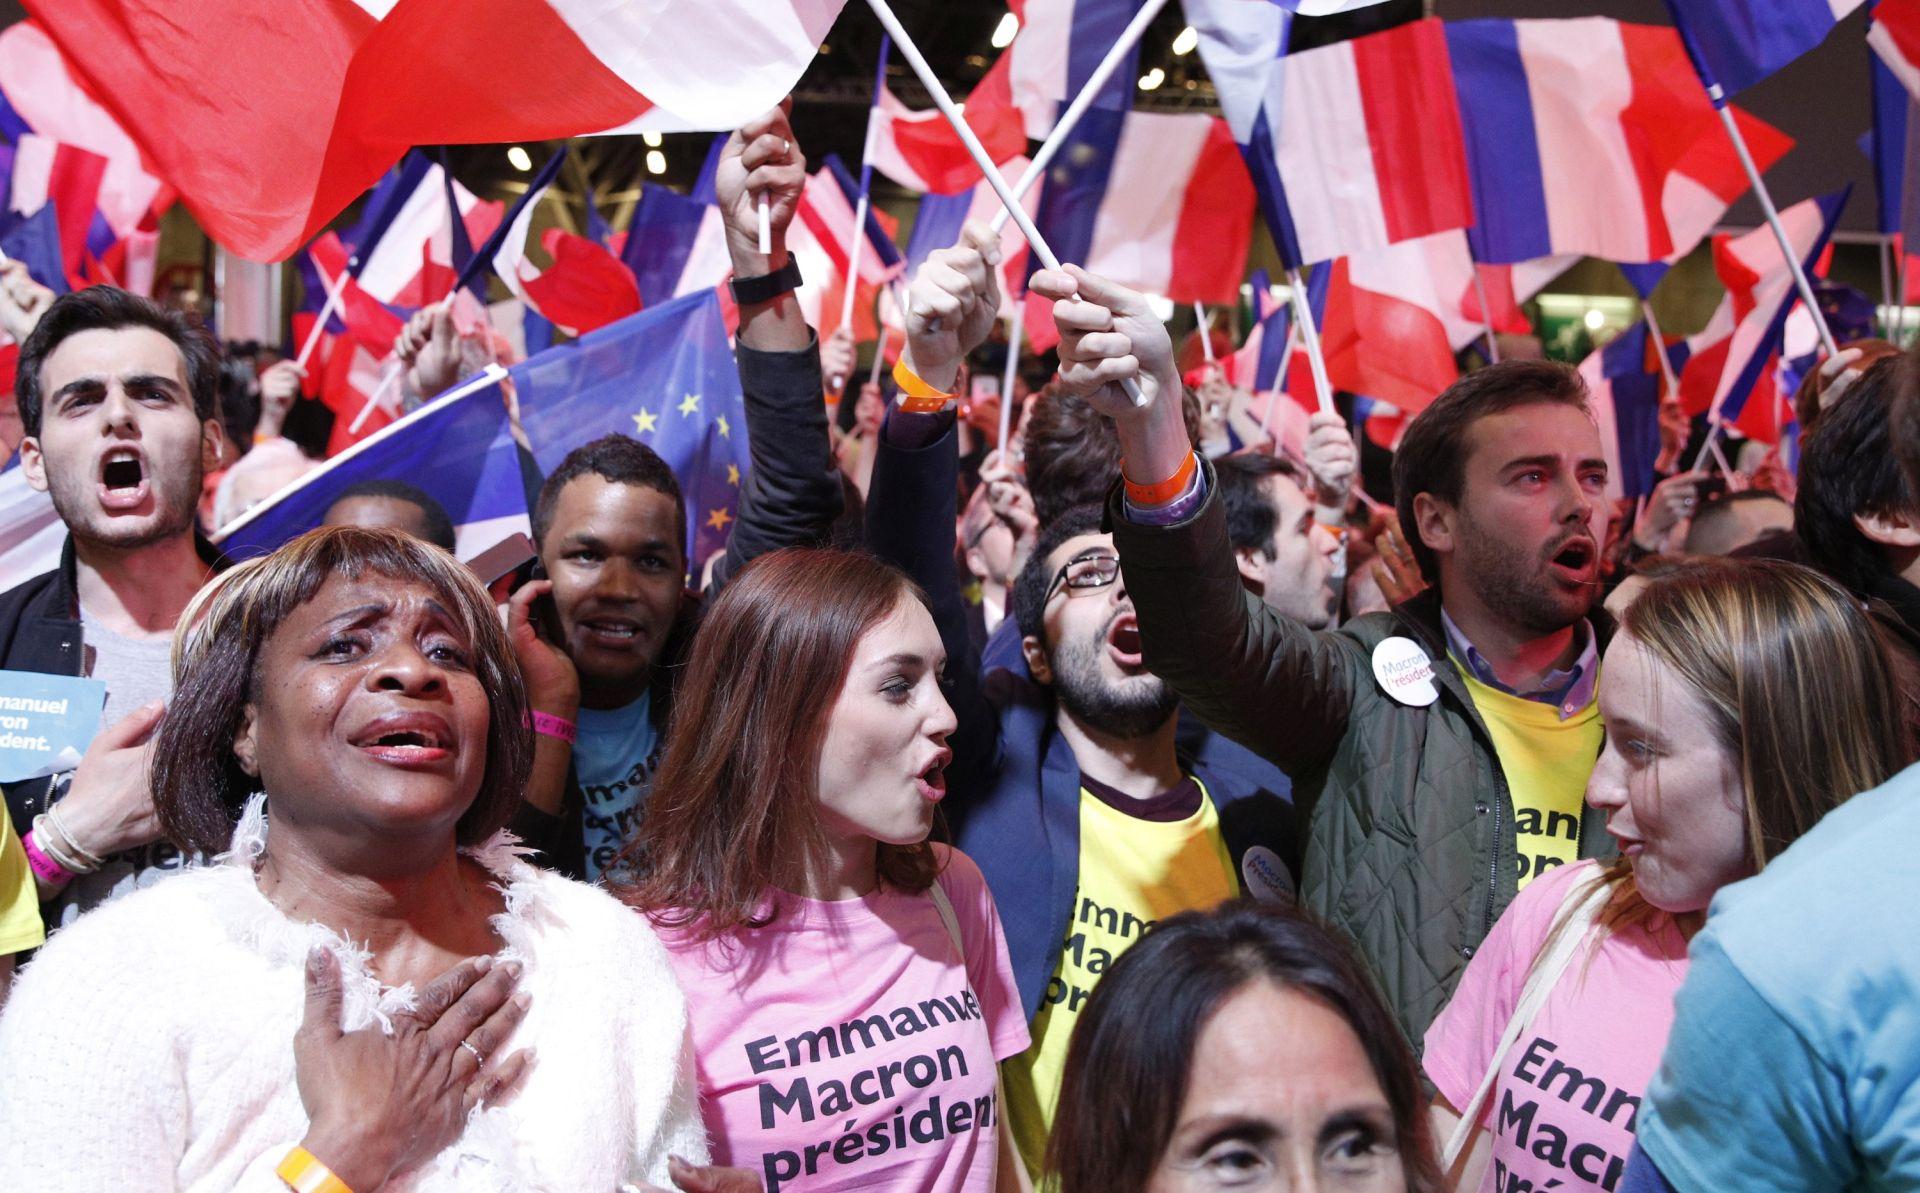 Macron favorit protiv Le Pen u drugom krugu